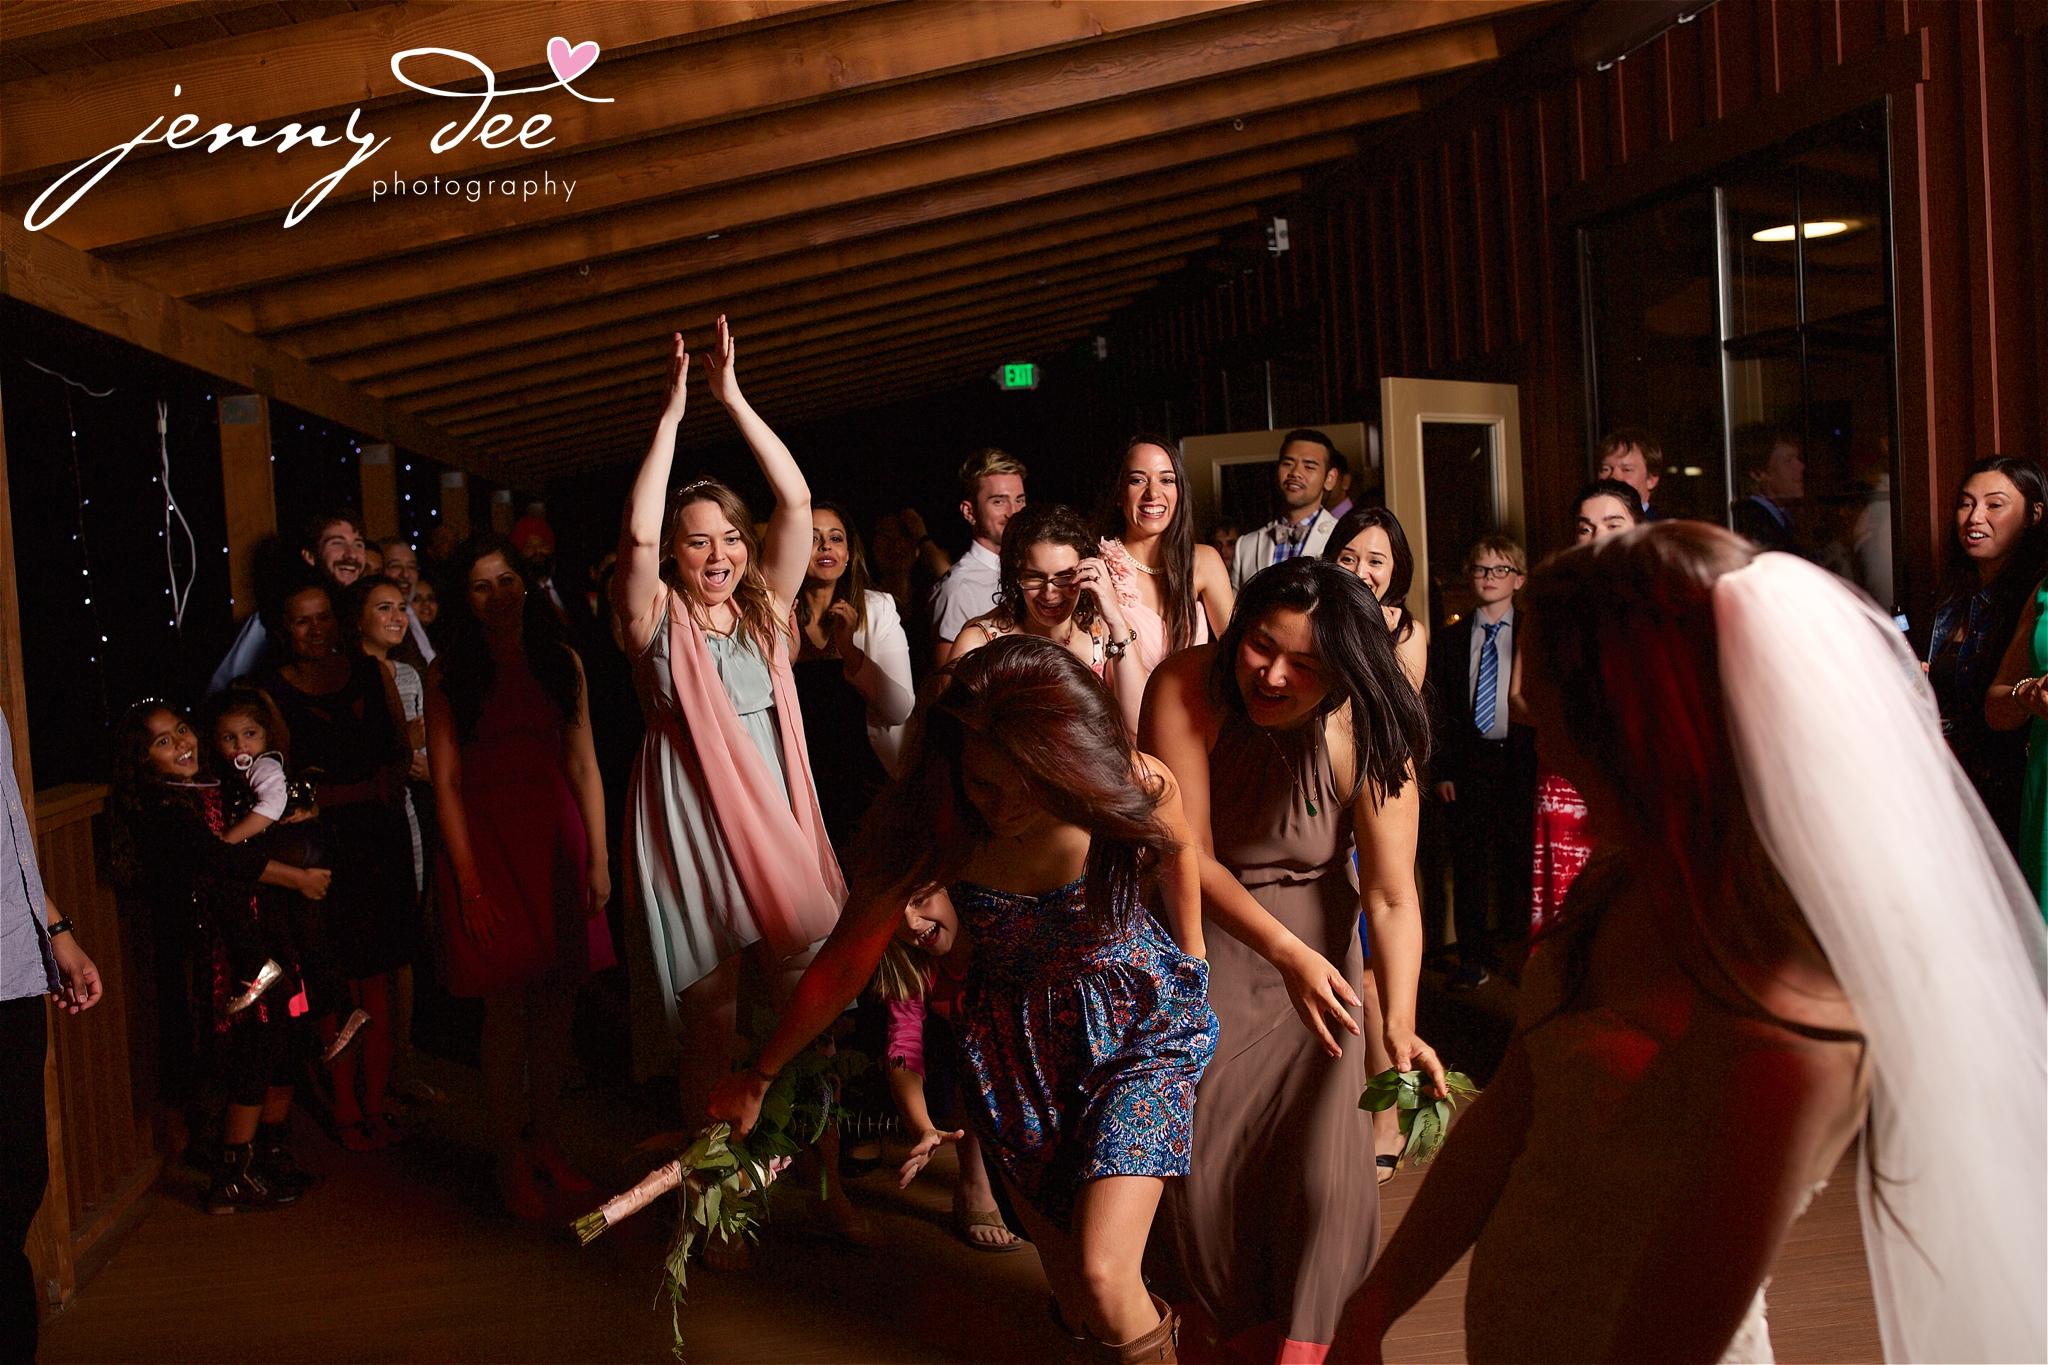 Jenny And Tommys Wedding At Camp Ymca Loma Mar 107 San Francisco Bay Area Wedding Photography Jenny Dee Photography